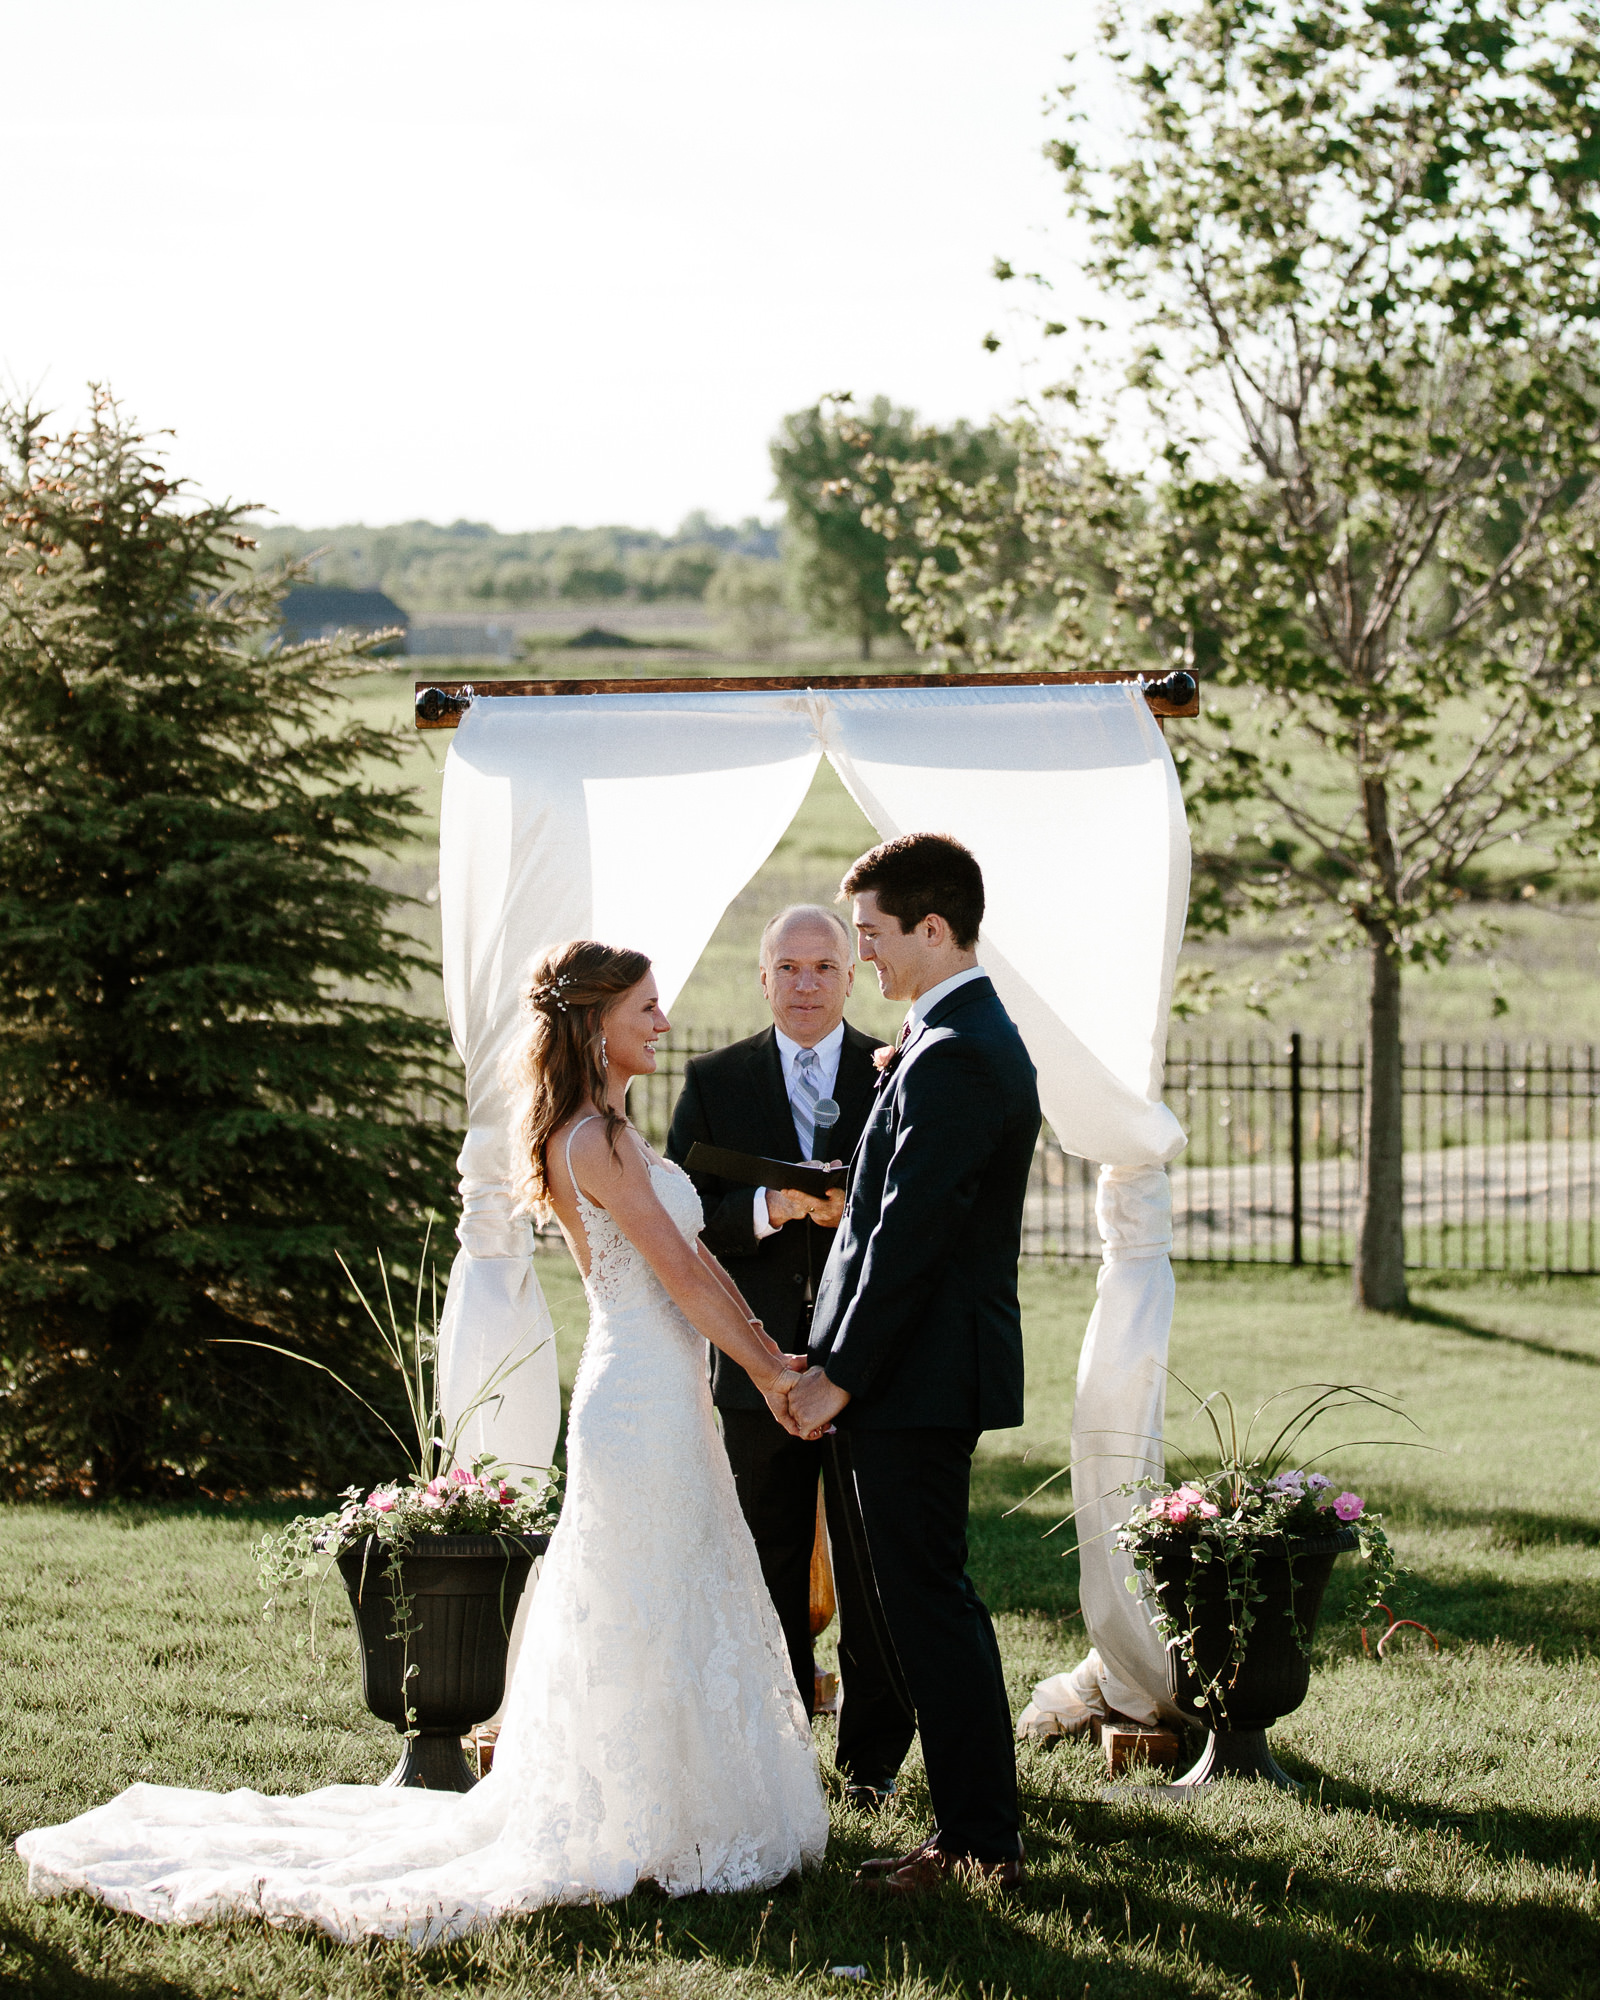 wedding-elopement-adventerous-romantic-timeless-south-dakota-blue-haven-barn-055.jpg